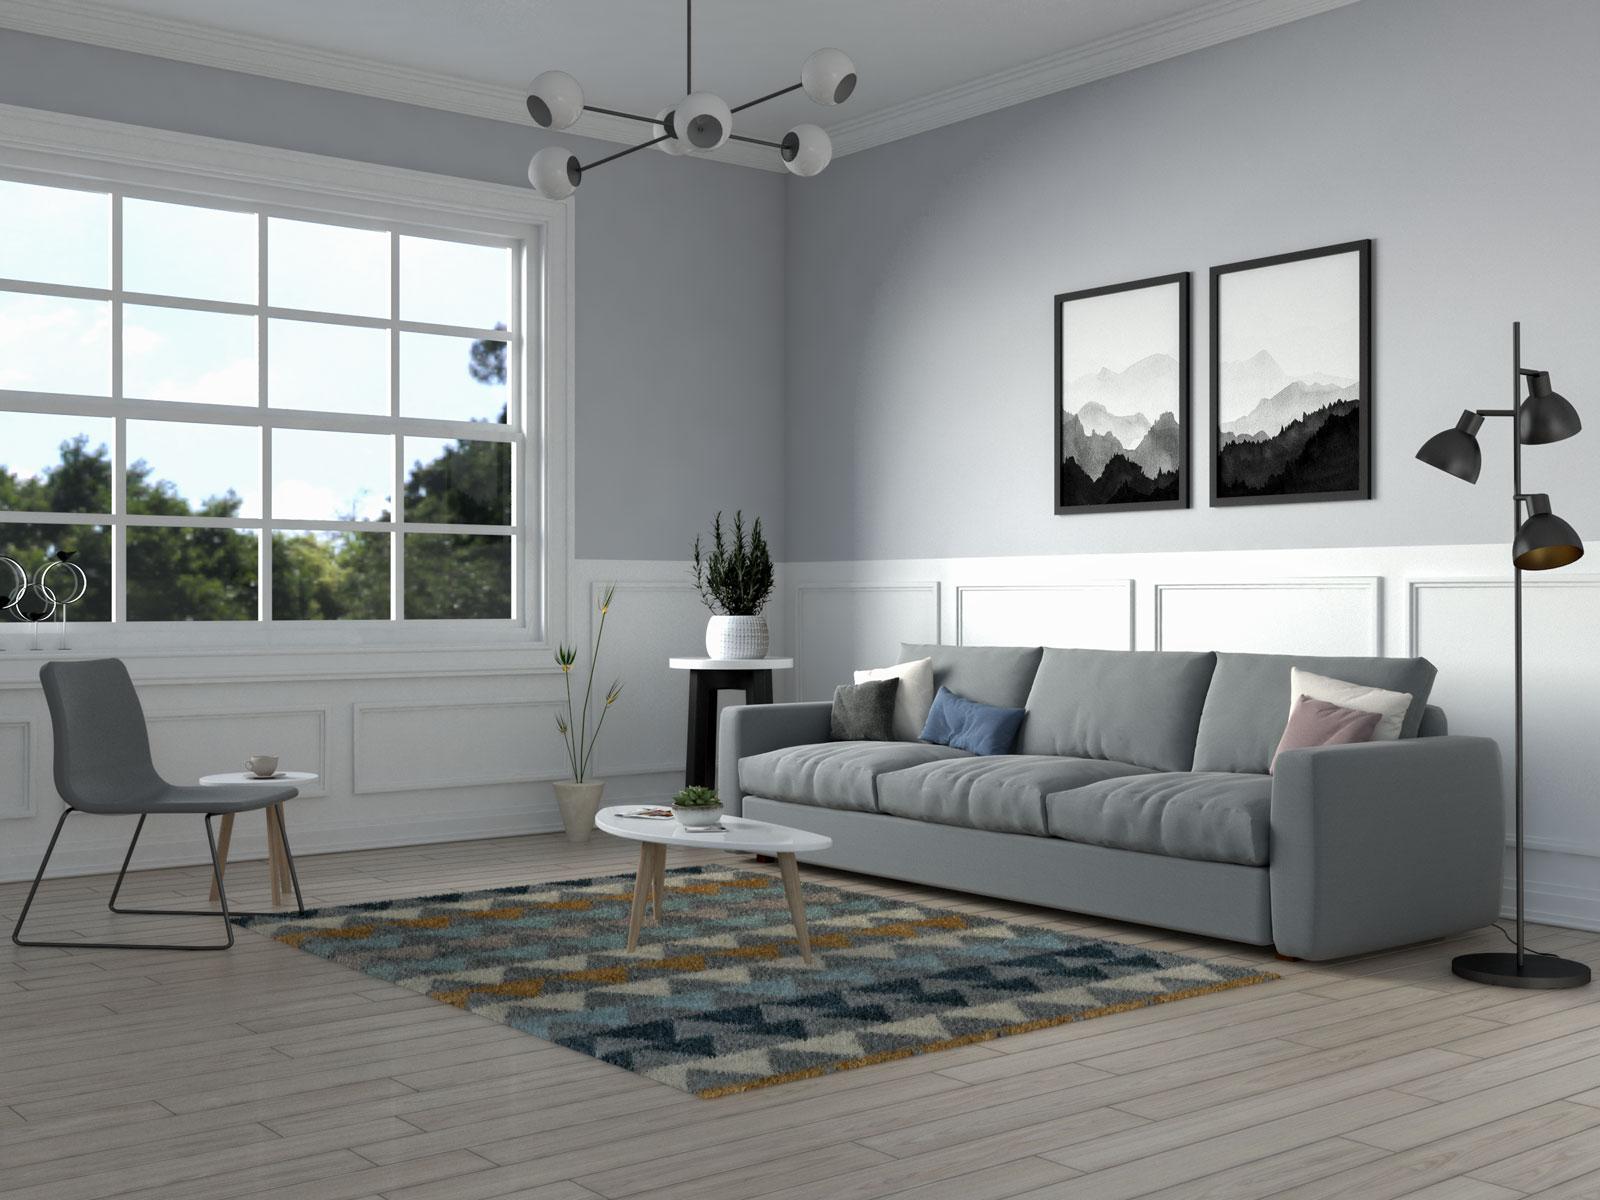 Triangle geometric pattern scandinavian living room